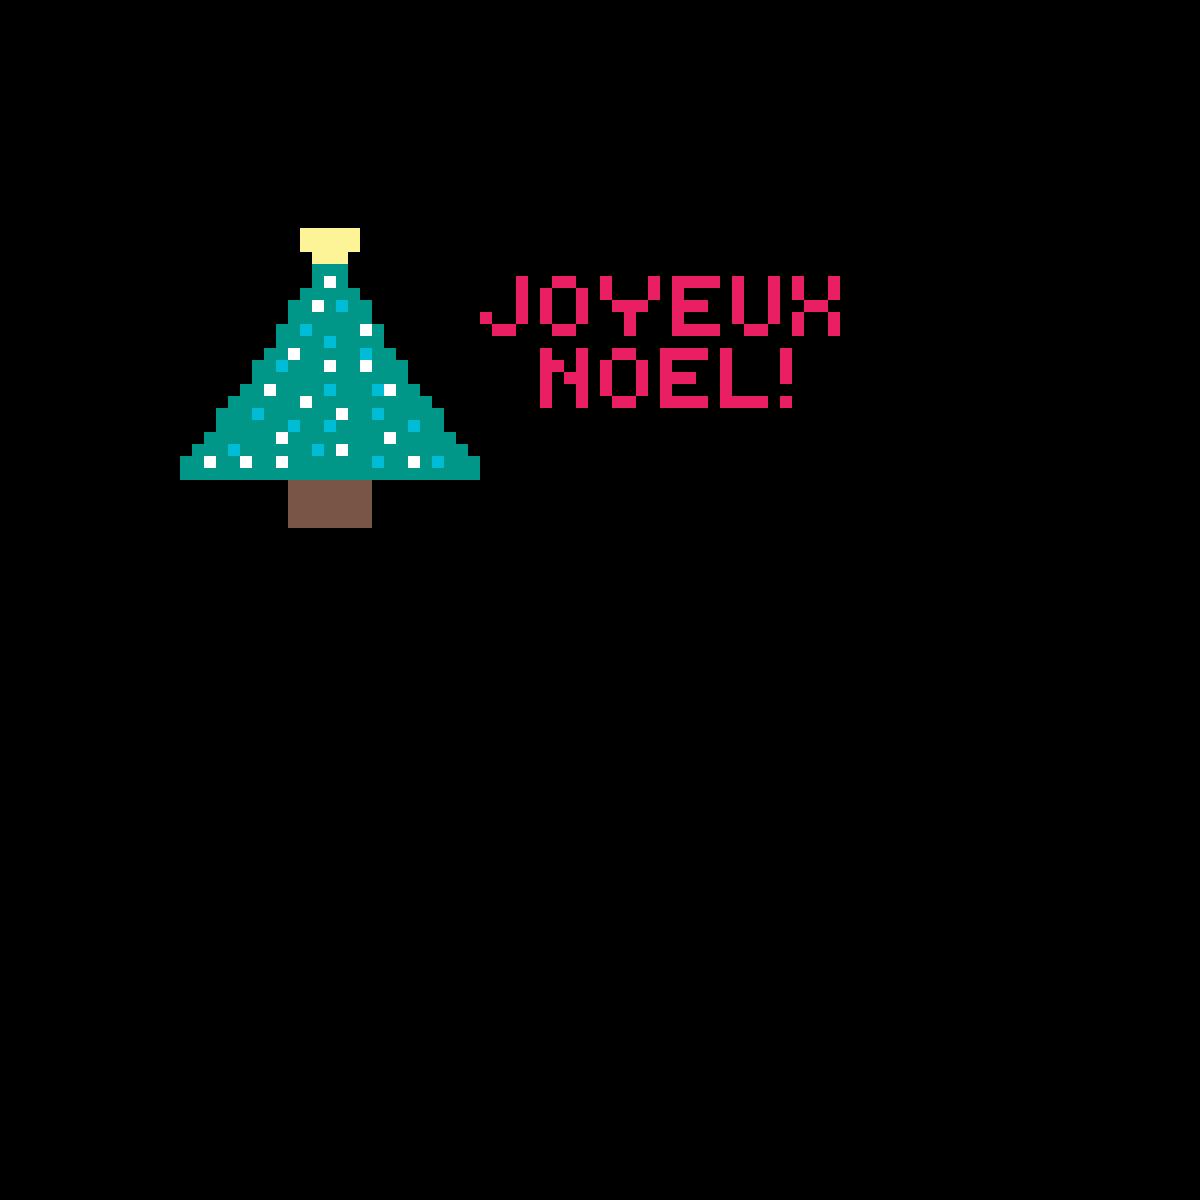 Pixilart Dessin De Noel En Pixel Art Joyeux Noel By